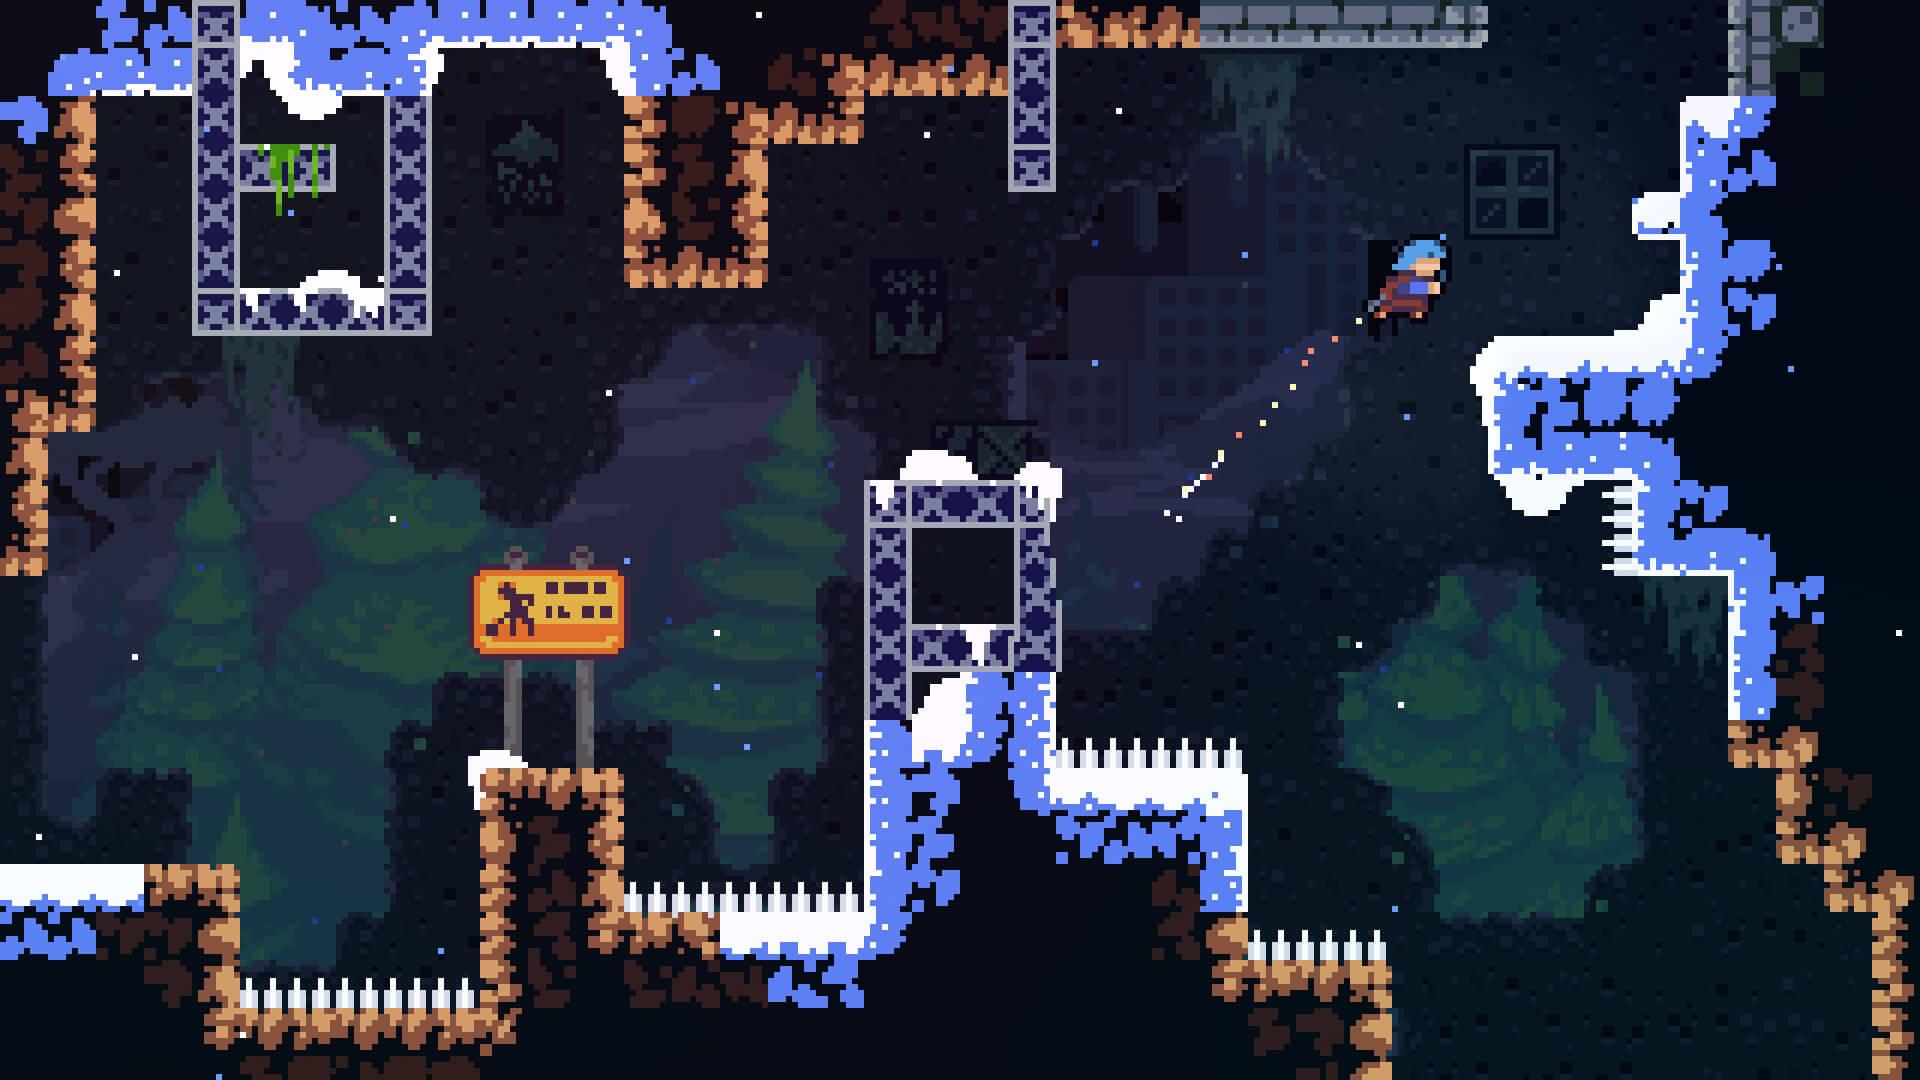 celeste-gioco-invernale-tech-princess